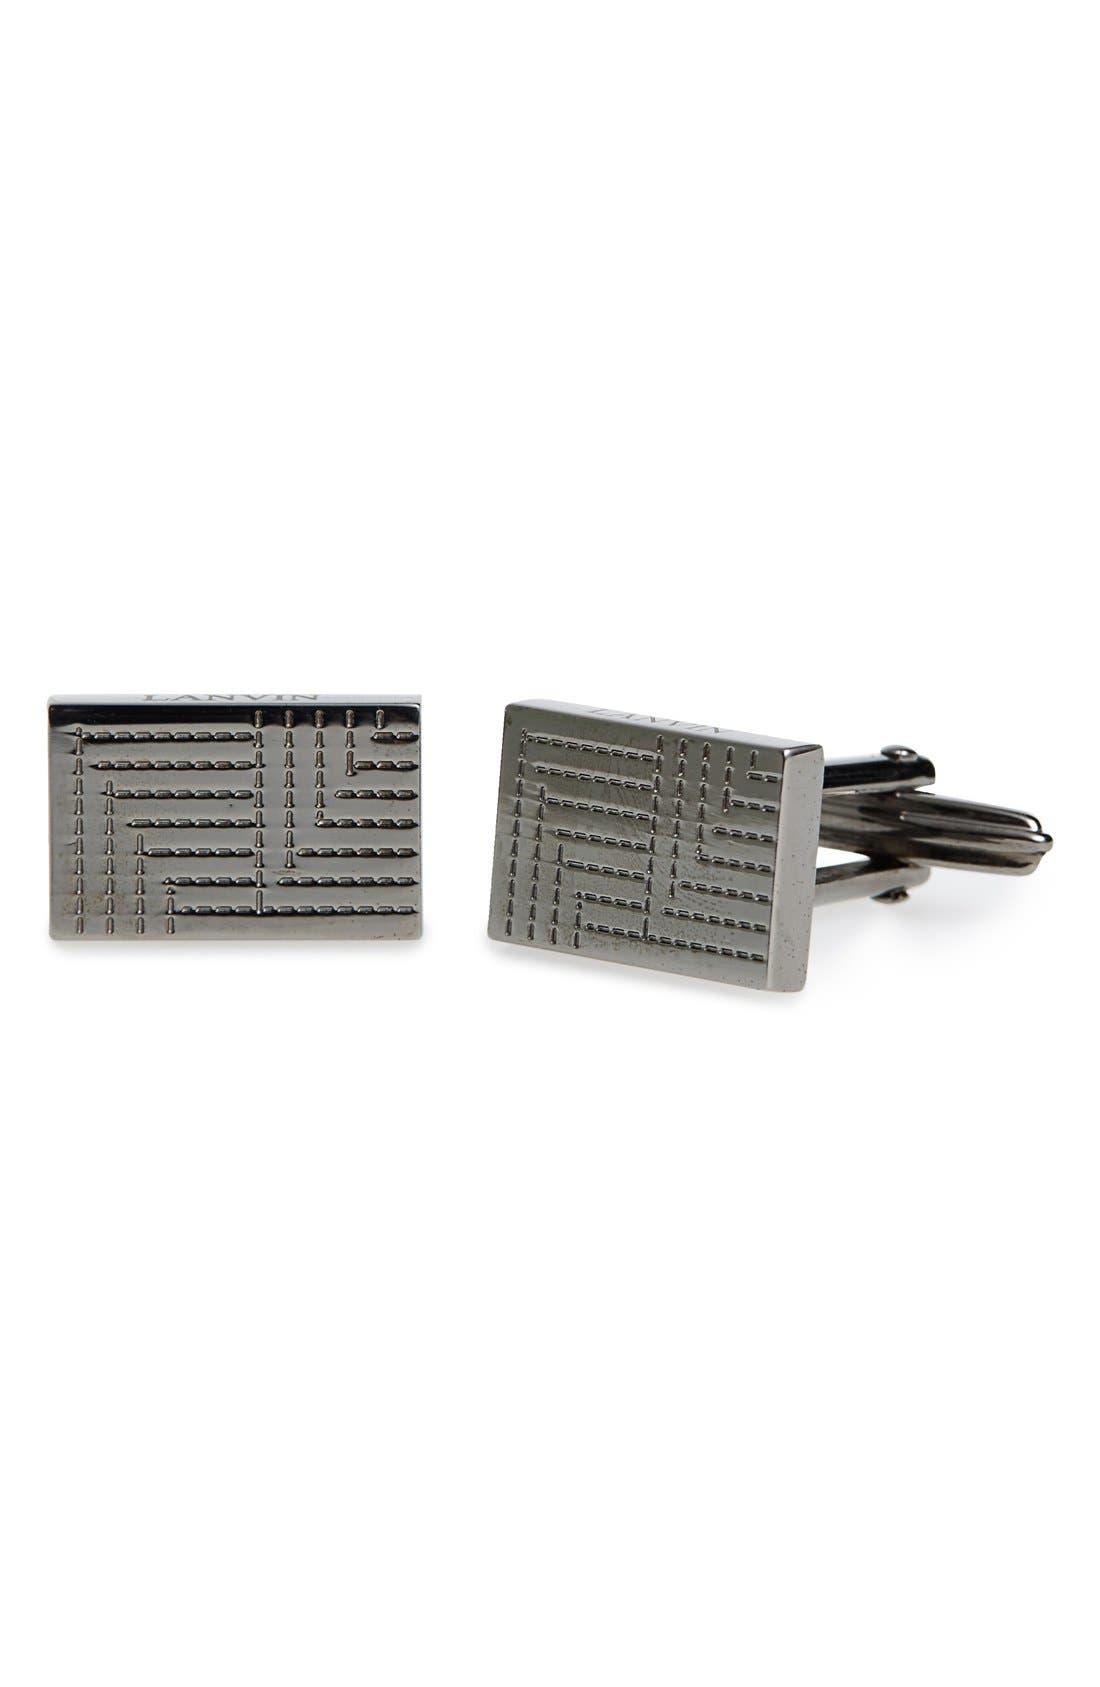 Main Image - Lanvin Textured Metal Plaque Rectangular Cuff Links